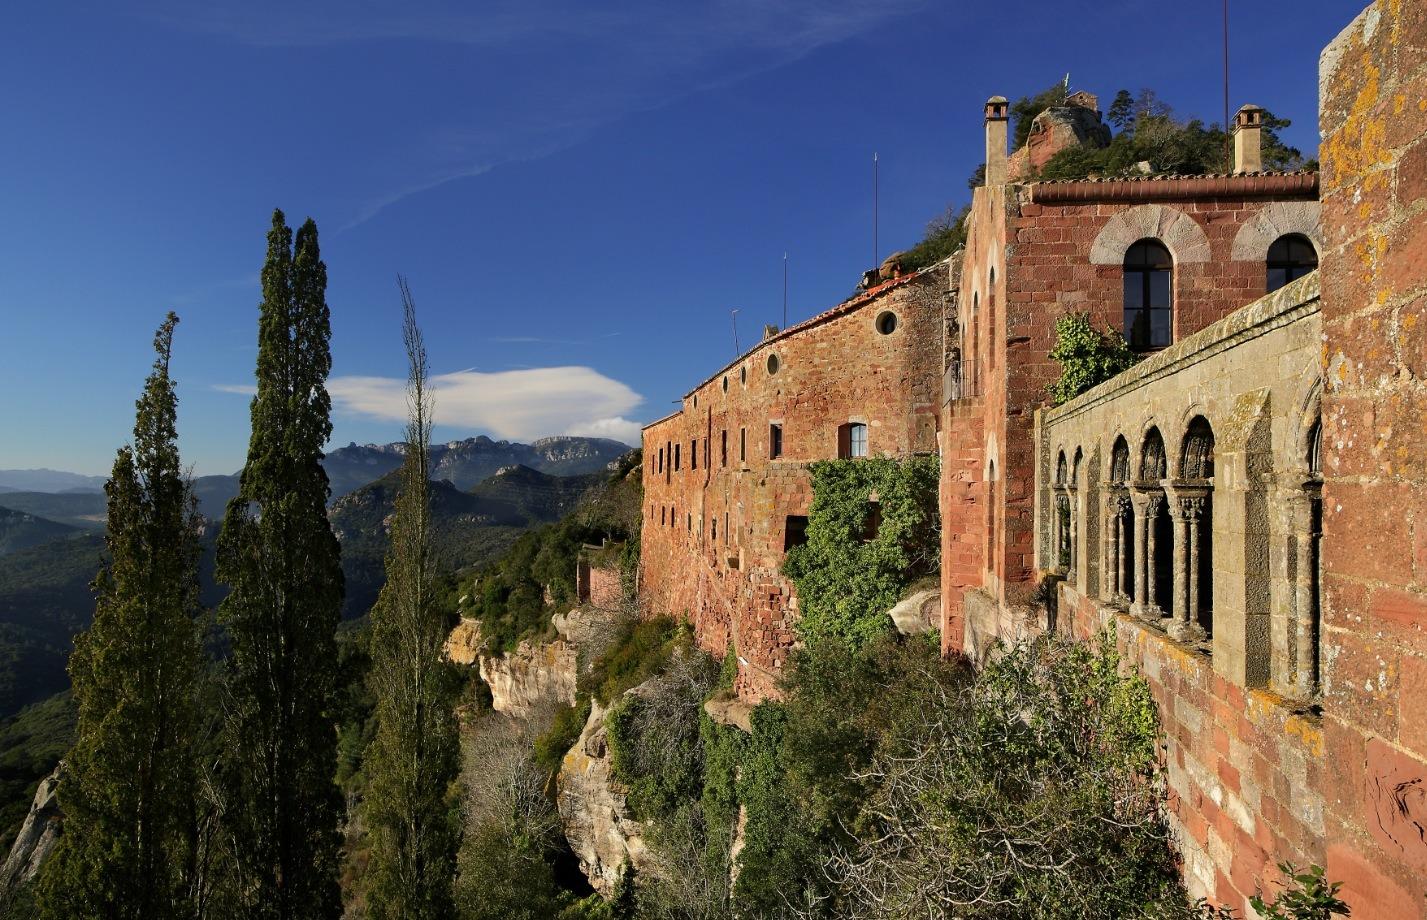 Castle-Monastery of Escornalbou (Riudecanyes)